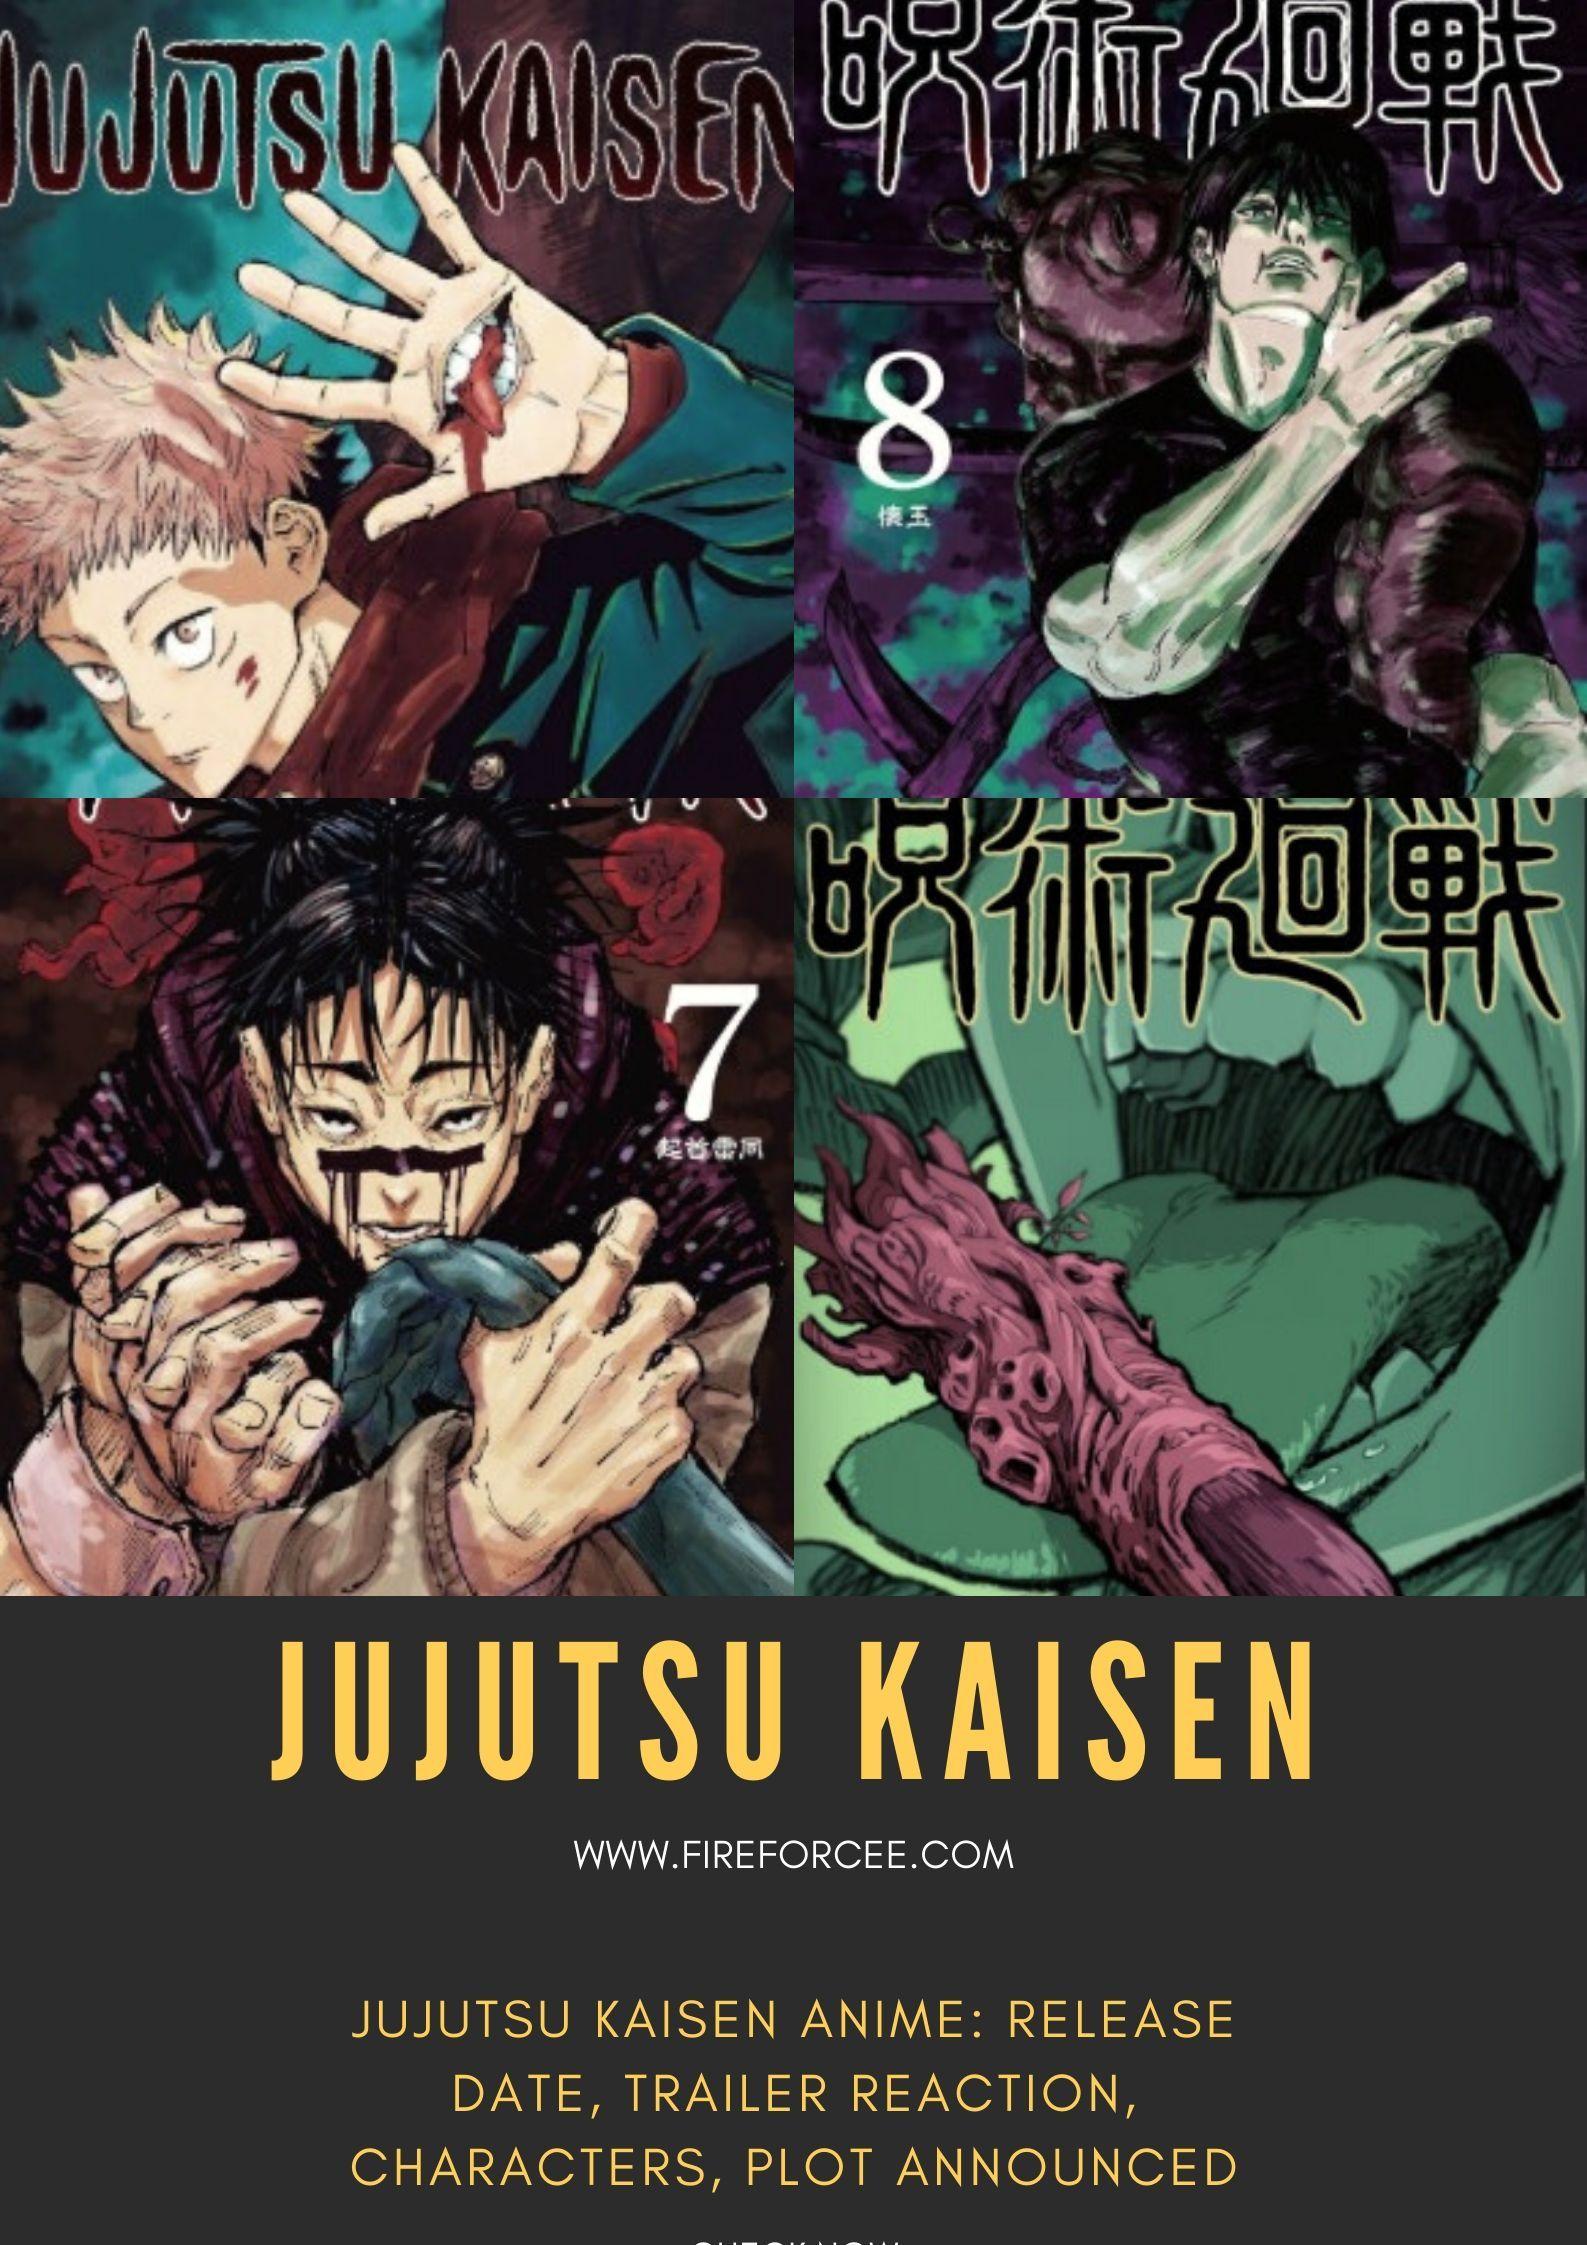 Jujutsu Kaisen Anime Release Date Trailer Reaction Characters Plot Announced Jujutsu Anime Anime Release Dates